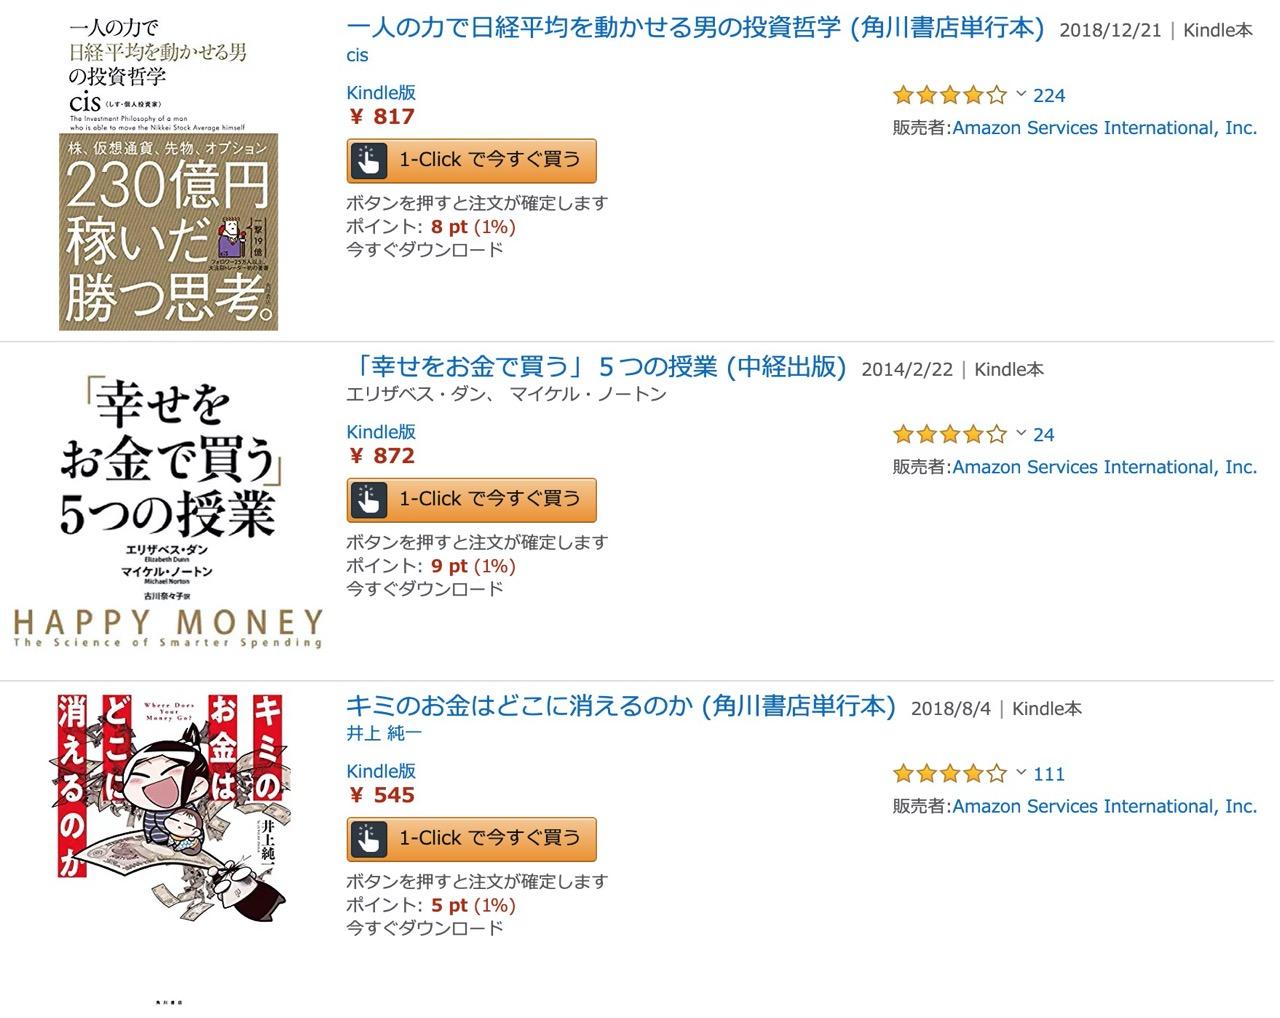 【Kindleセール】キミのお金はどこに消えるのか、一人の力で日経平均を動かせる男の投資哲学など「KADOKAWAマネー本フェア」(11/14まで)